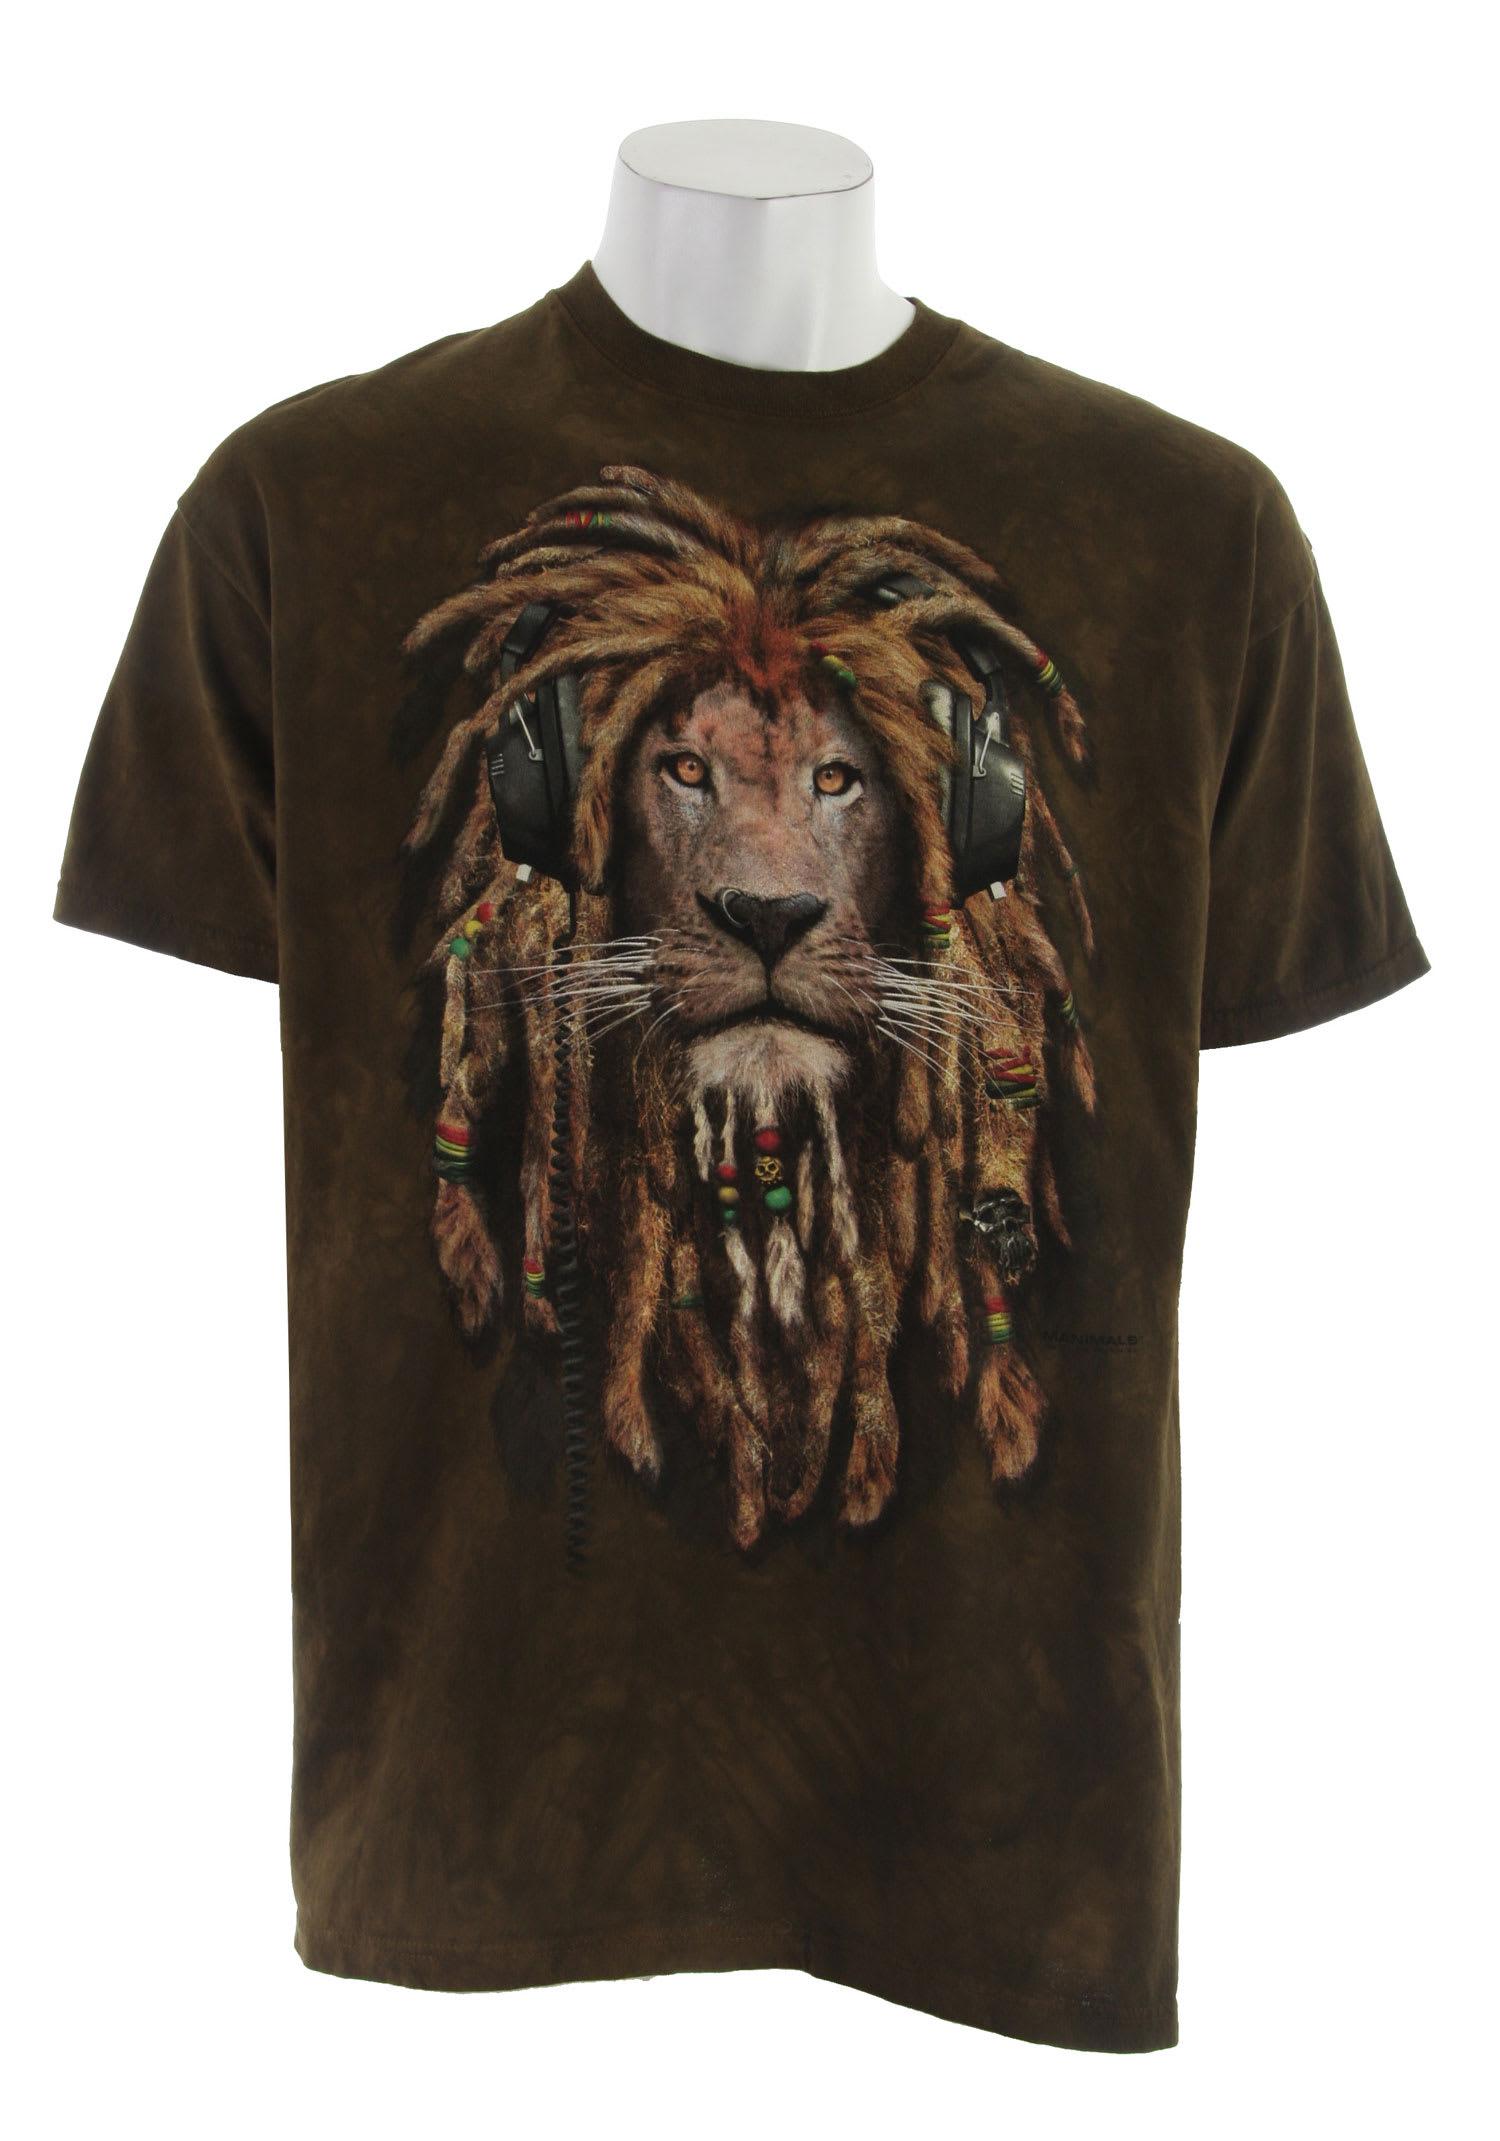 element lion shirt shirts